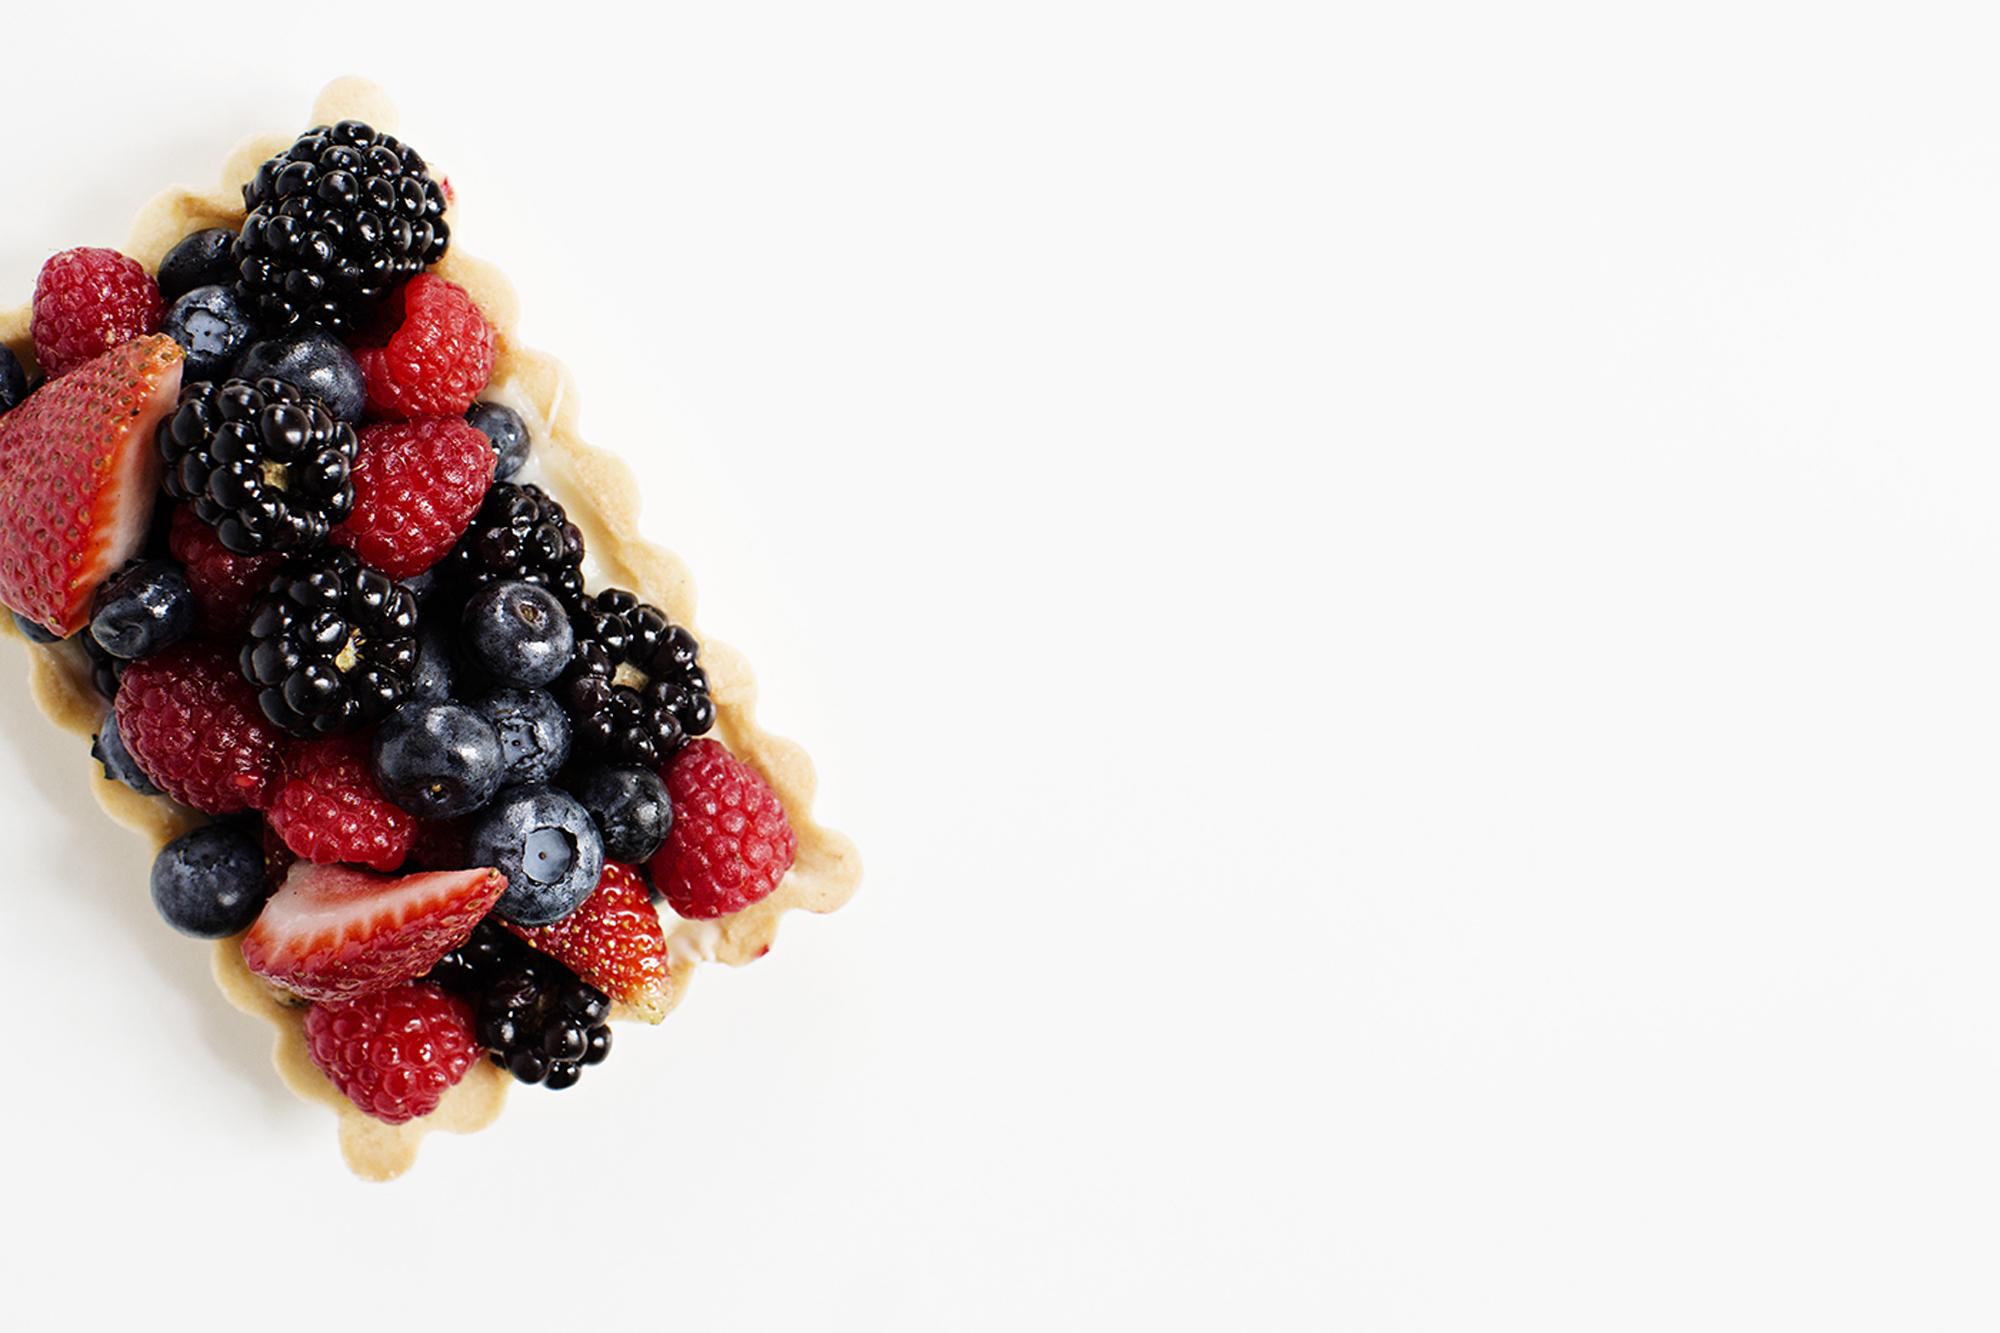 Food Photography Company